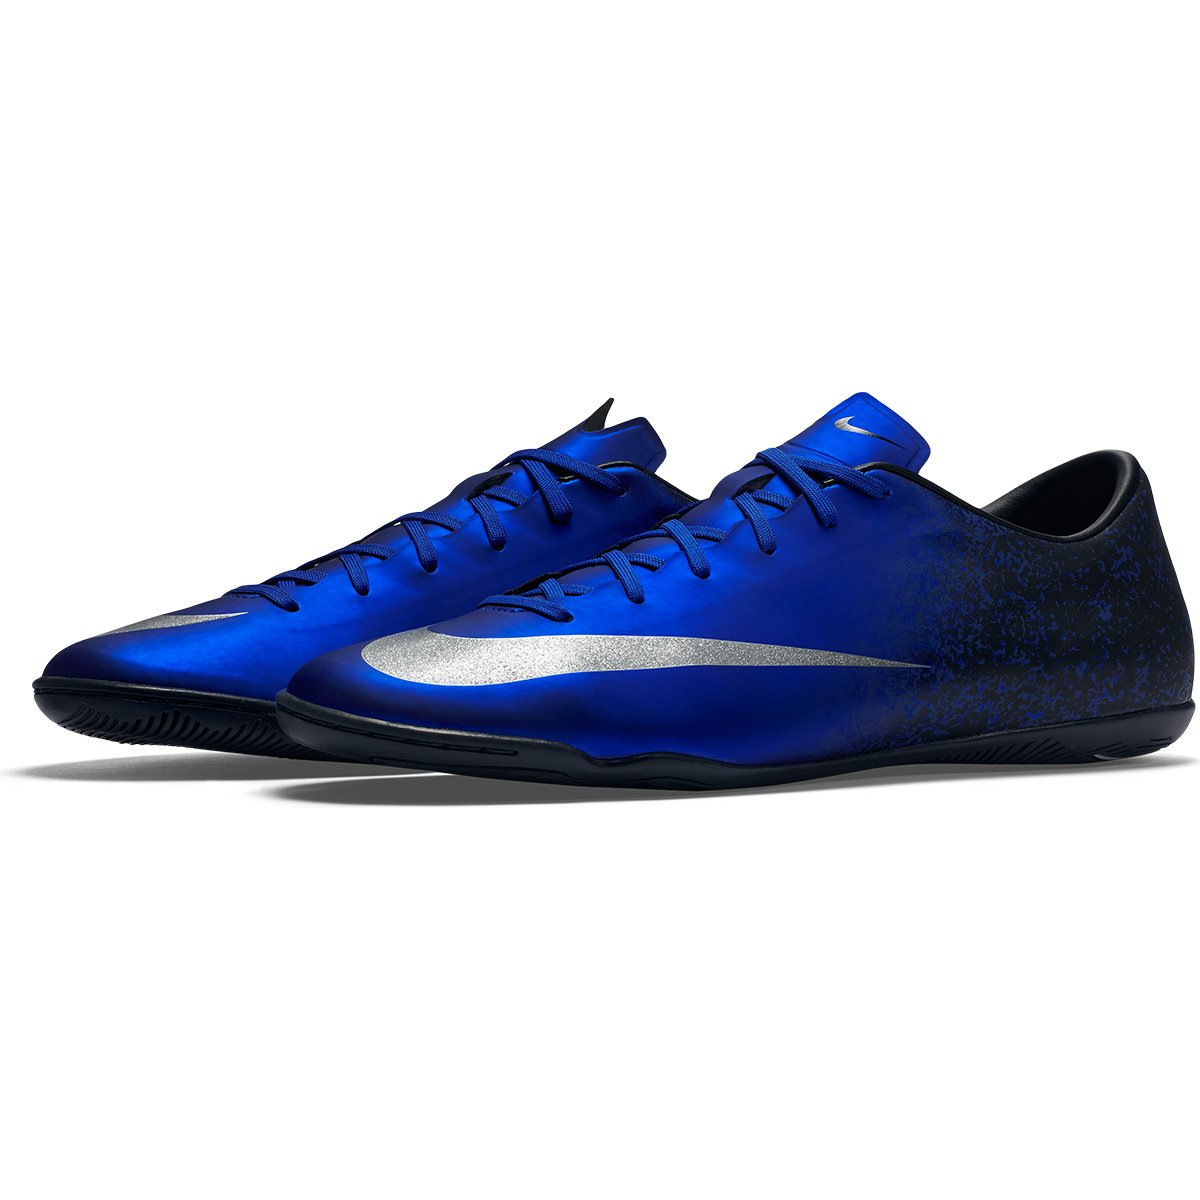 d1618c8cff661 ... uk chuteira nike mercurial victory 5 cr7 ic futsal azul e prata 0309d  86d32 ...